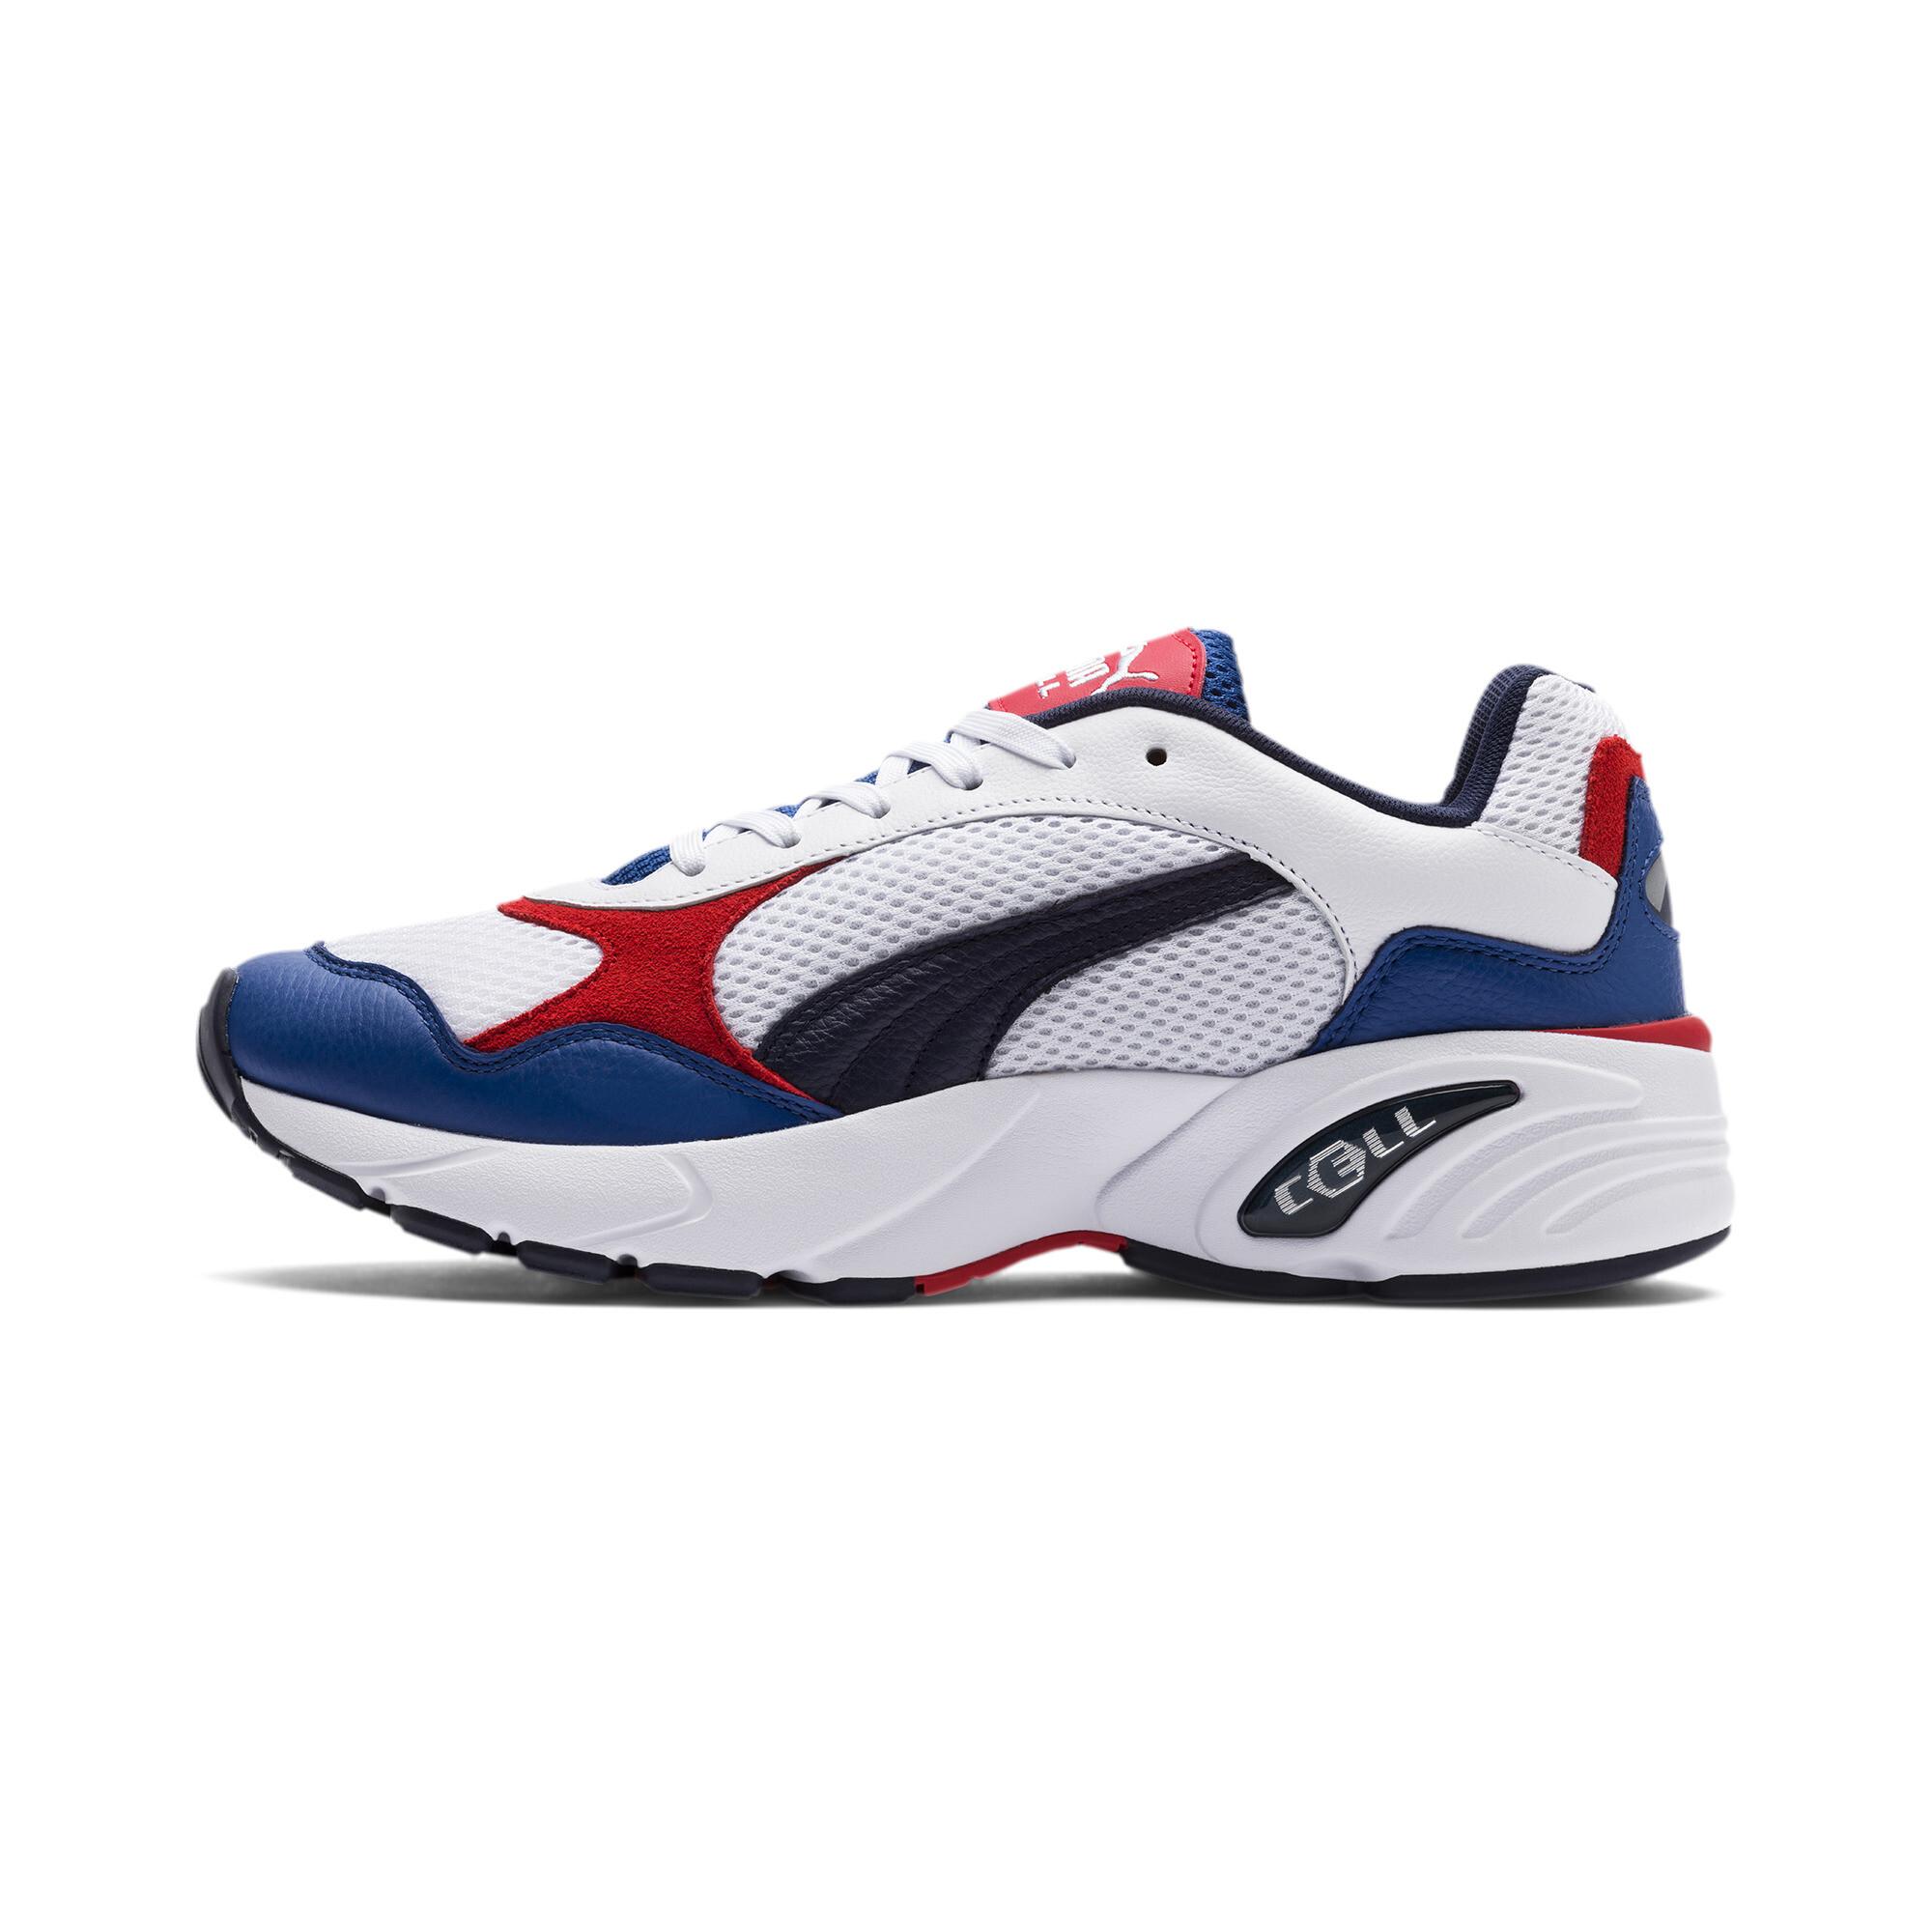 Indexbild 10 - PUMA CELL Viper Leather Sneaker Unisex Schuhe Sport Classics Neu